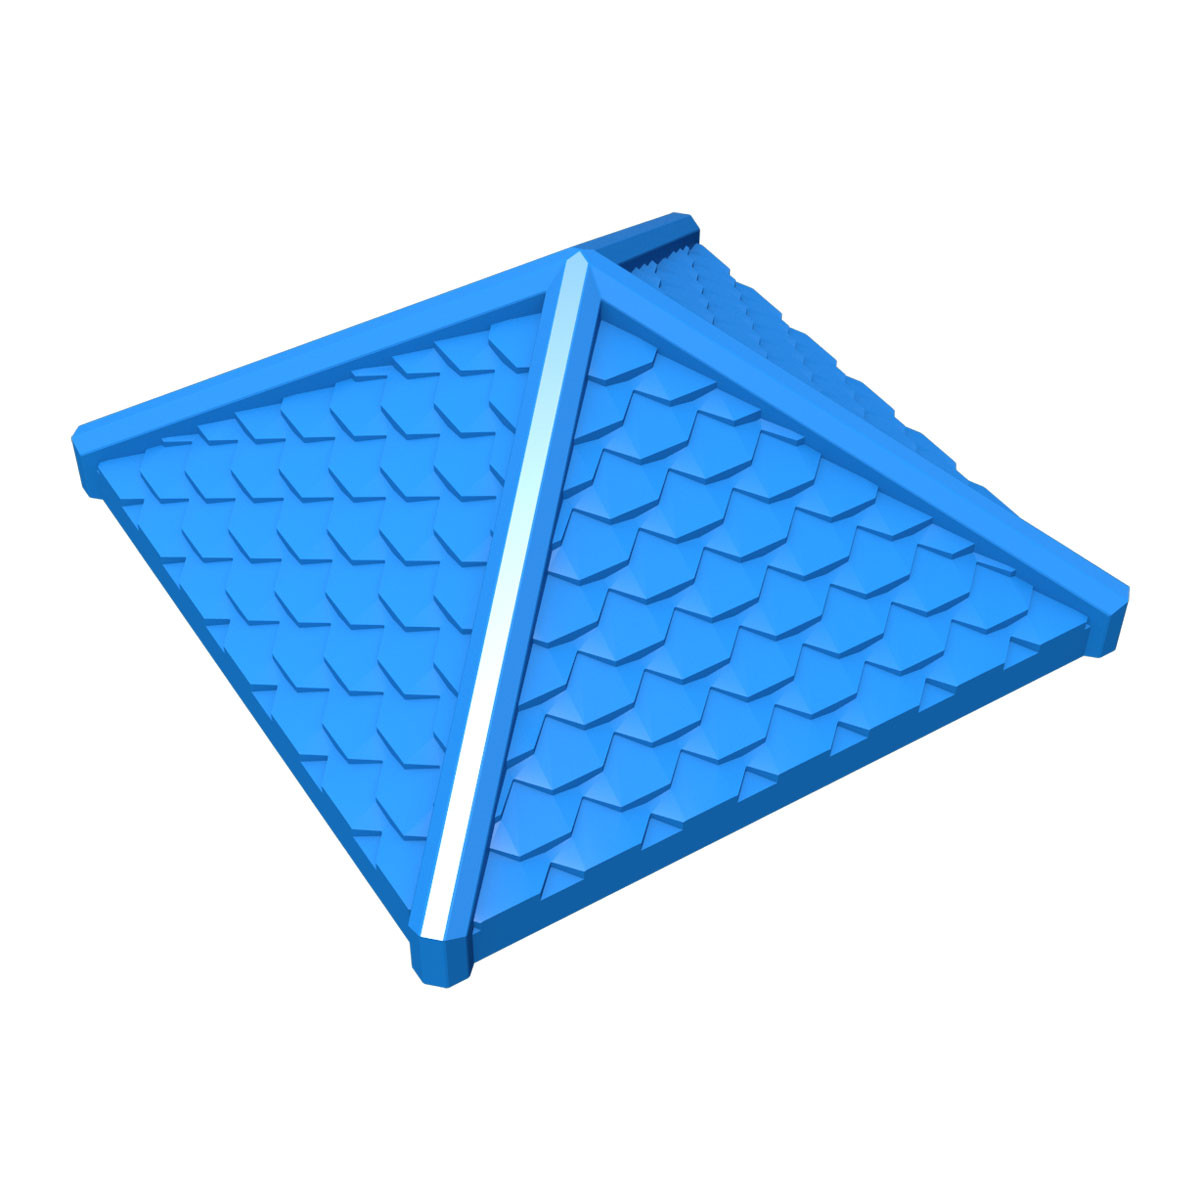 Shingled Pyramid Roof